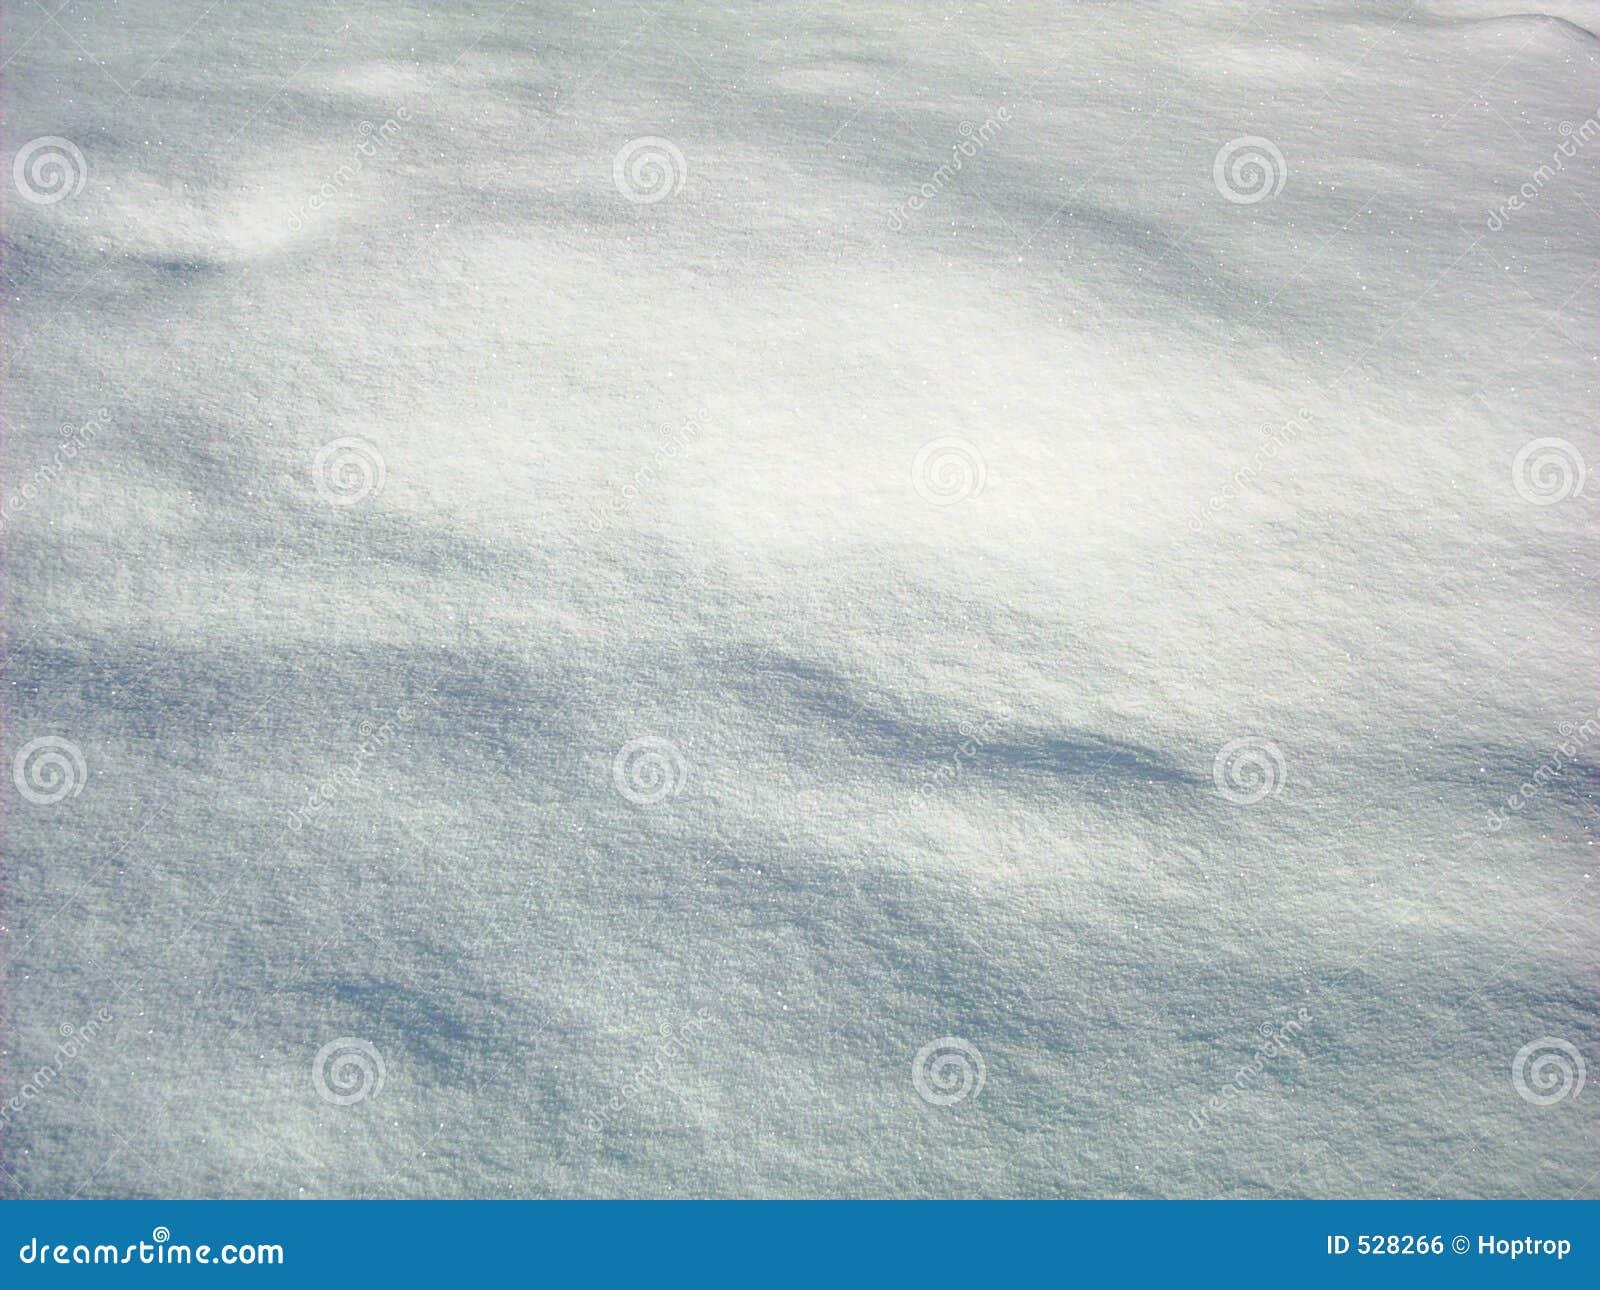 Download 雪纹理 库存照片. 图片 包括有 空白, 雪花, 背包, 影子, 室外, 冬天, 人们, 对象, 艺术, 温度 - 528266